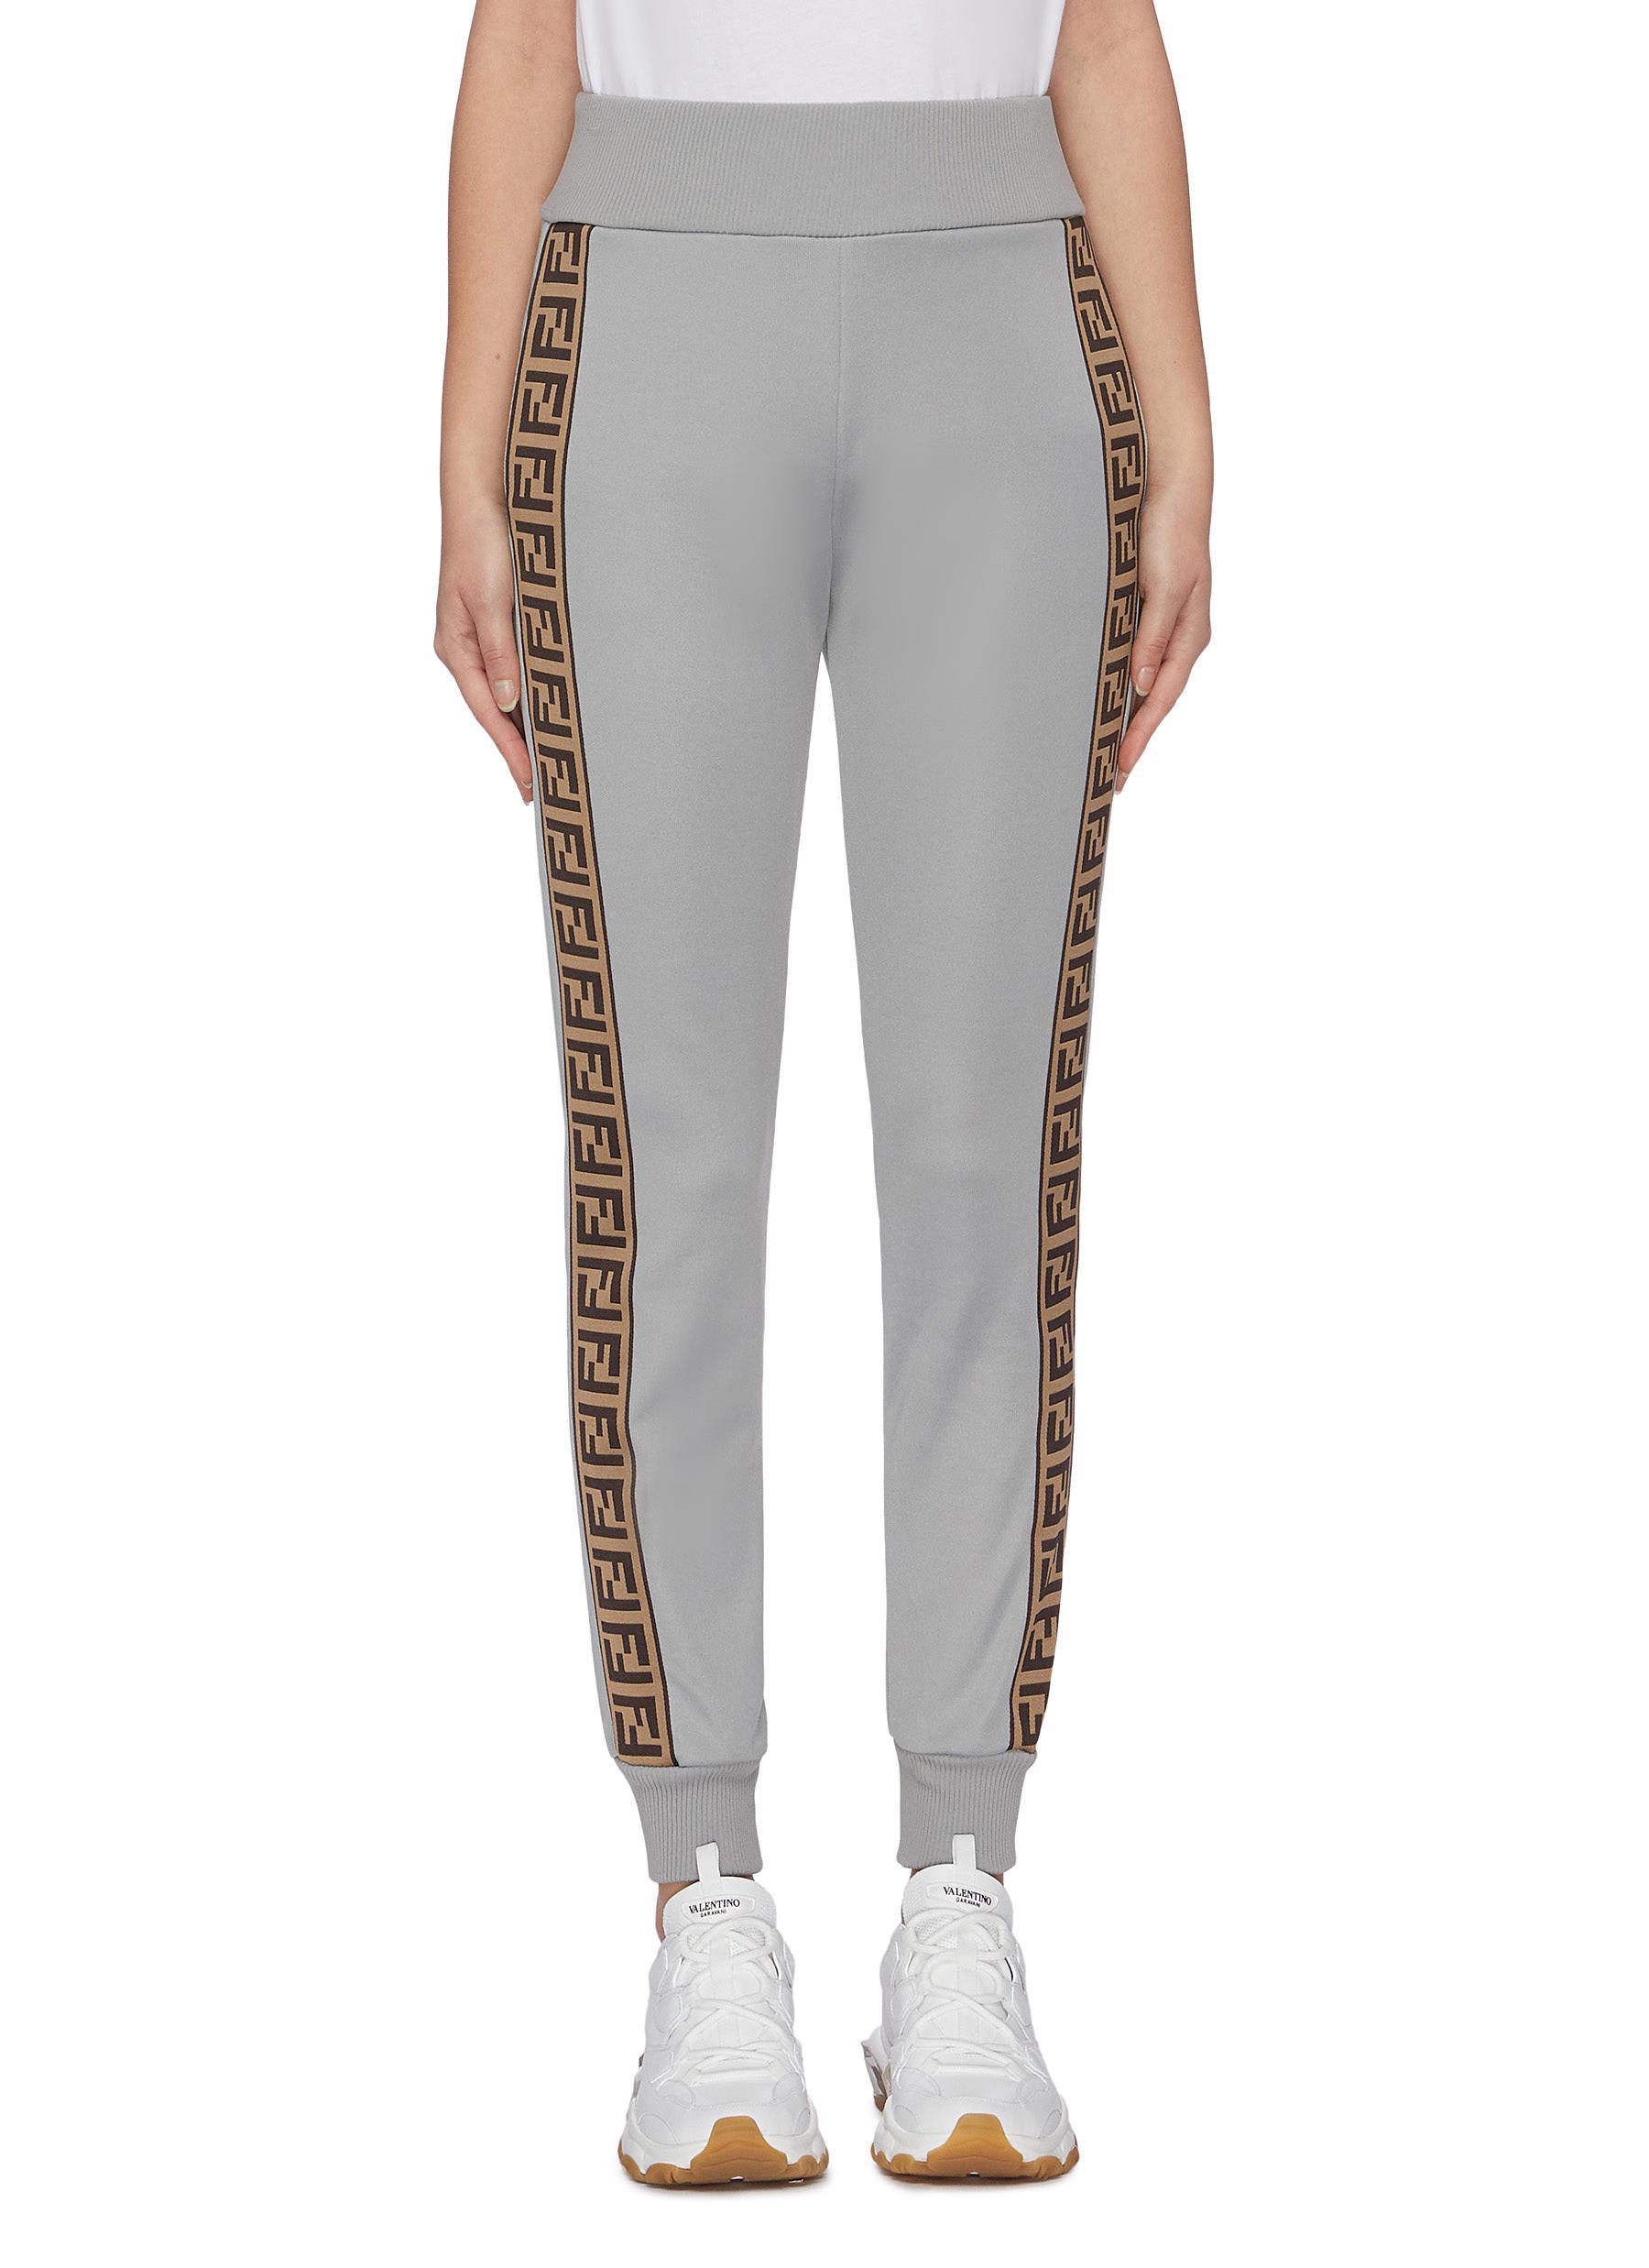 Fendirama logo stripe outseam sweat pants by Fendi Sport